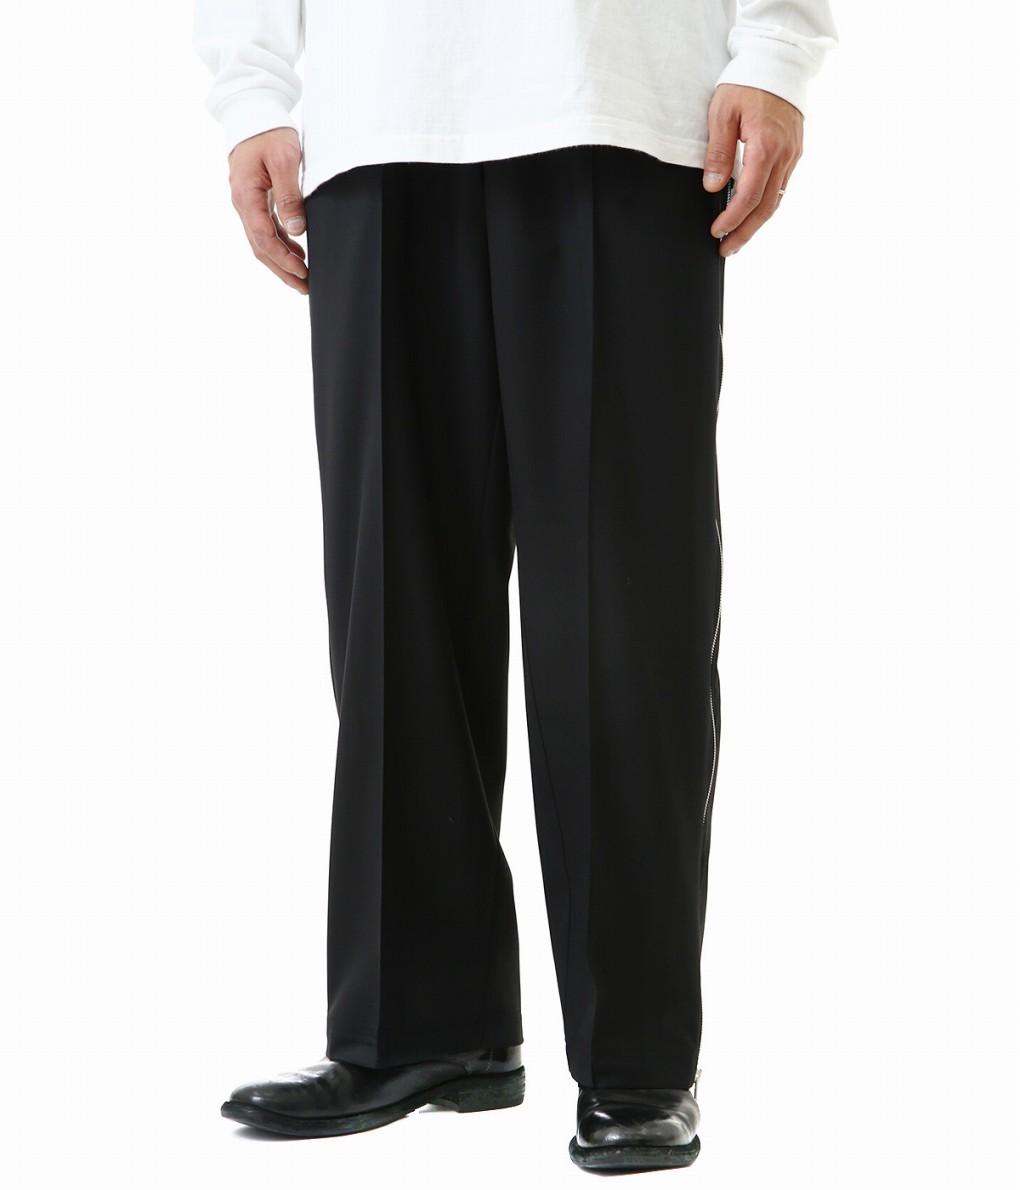 Maison Margiela / メゾン マルジェラ : WOOL POPELINE SIDE ZIP PANTS : ウール ポプリン サイド ジップ パンツ メンズ : S50KA0451 【RIP】